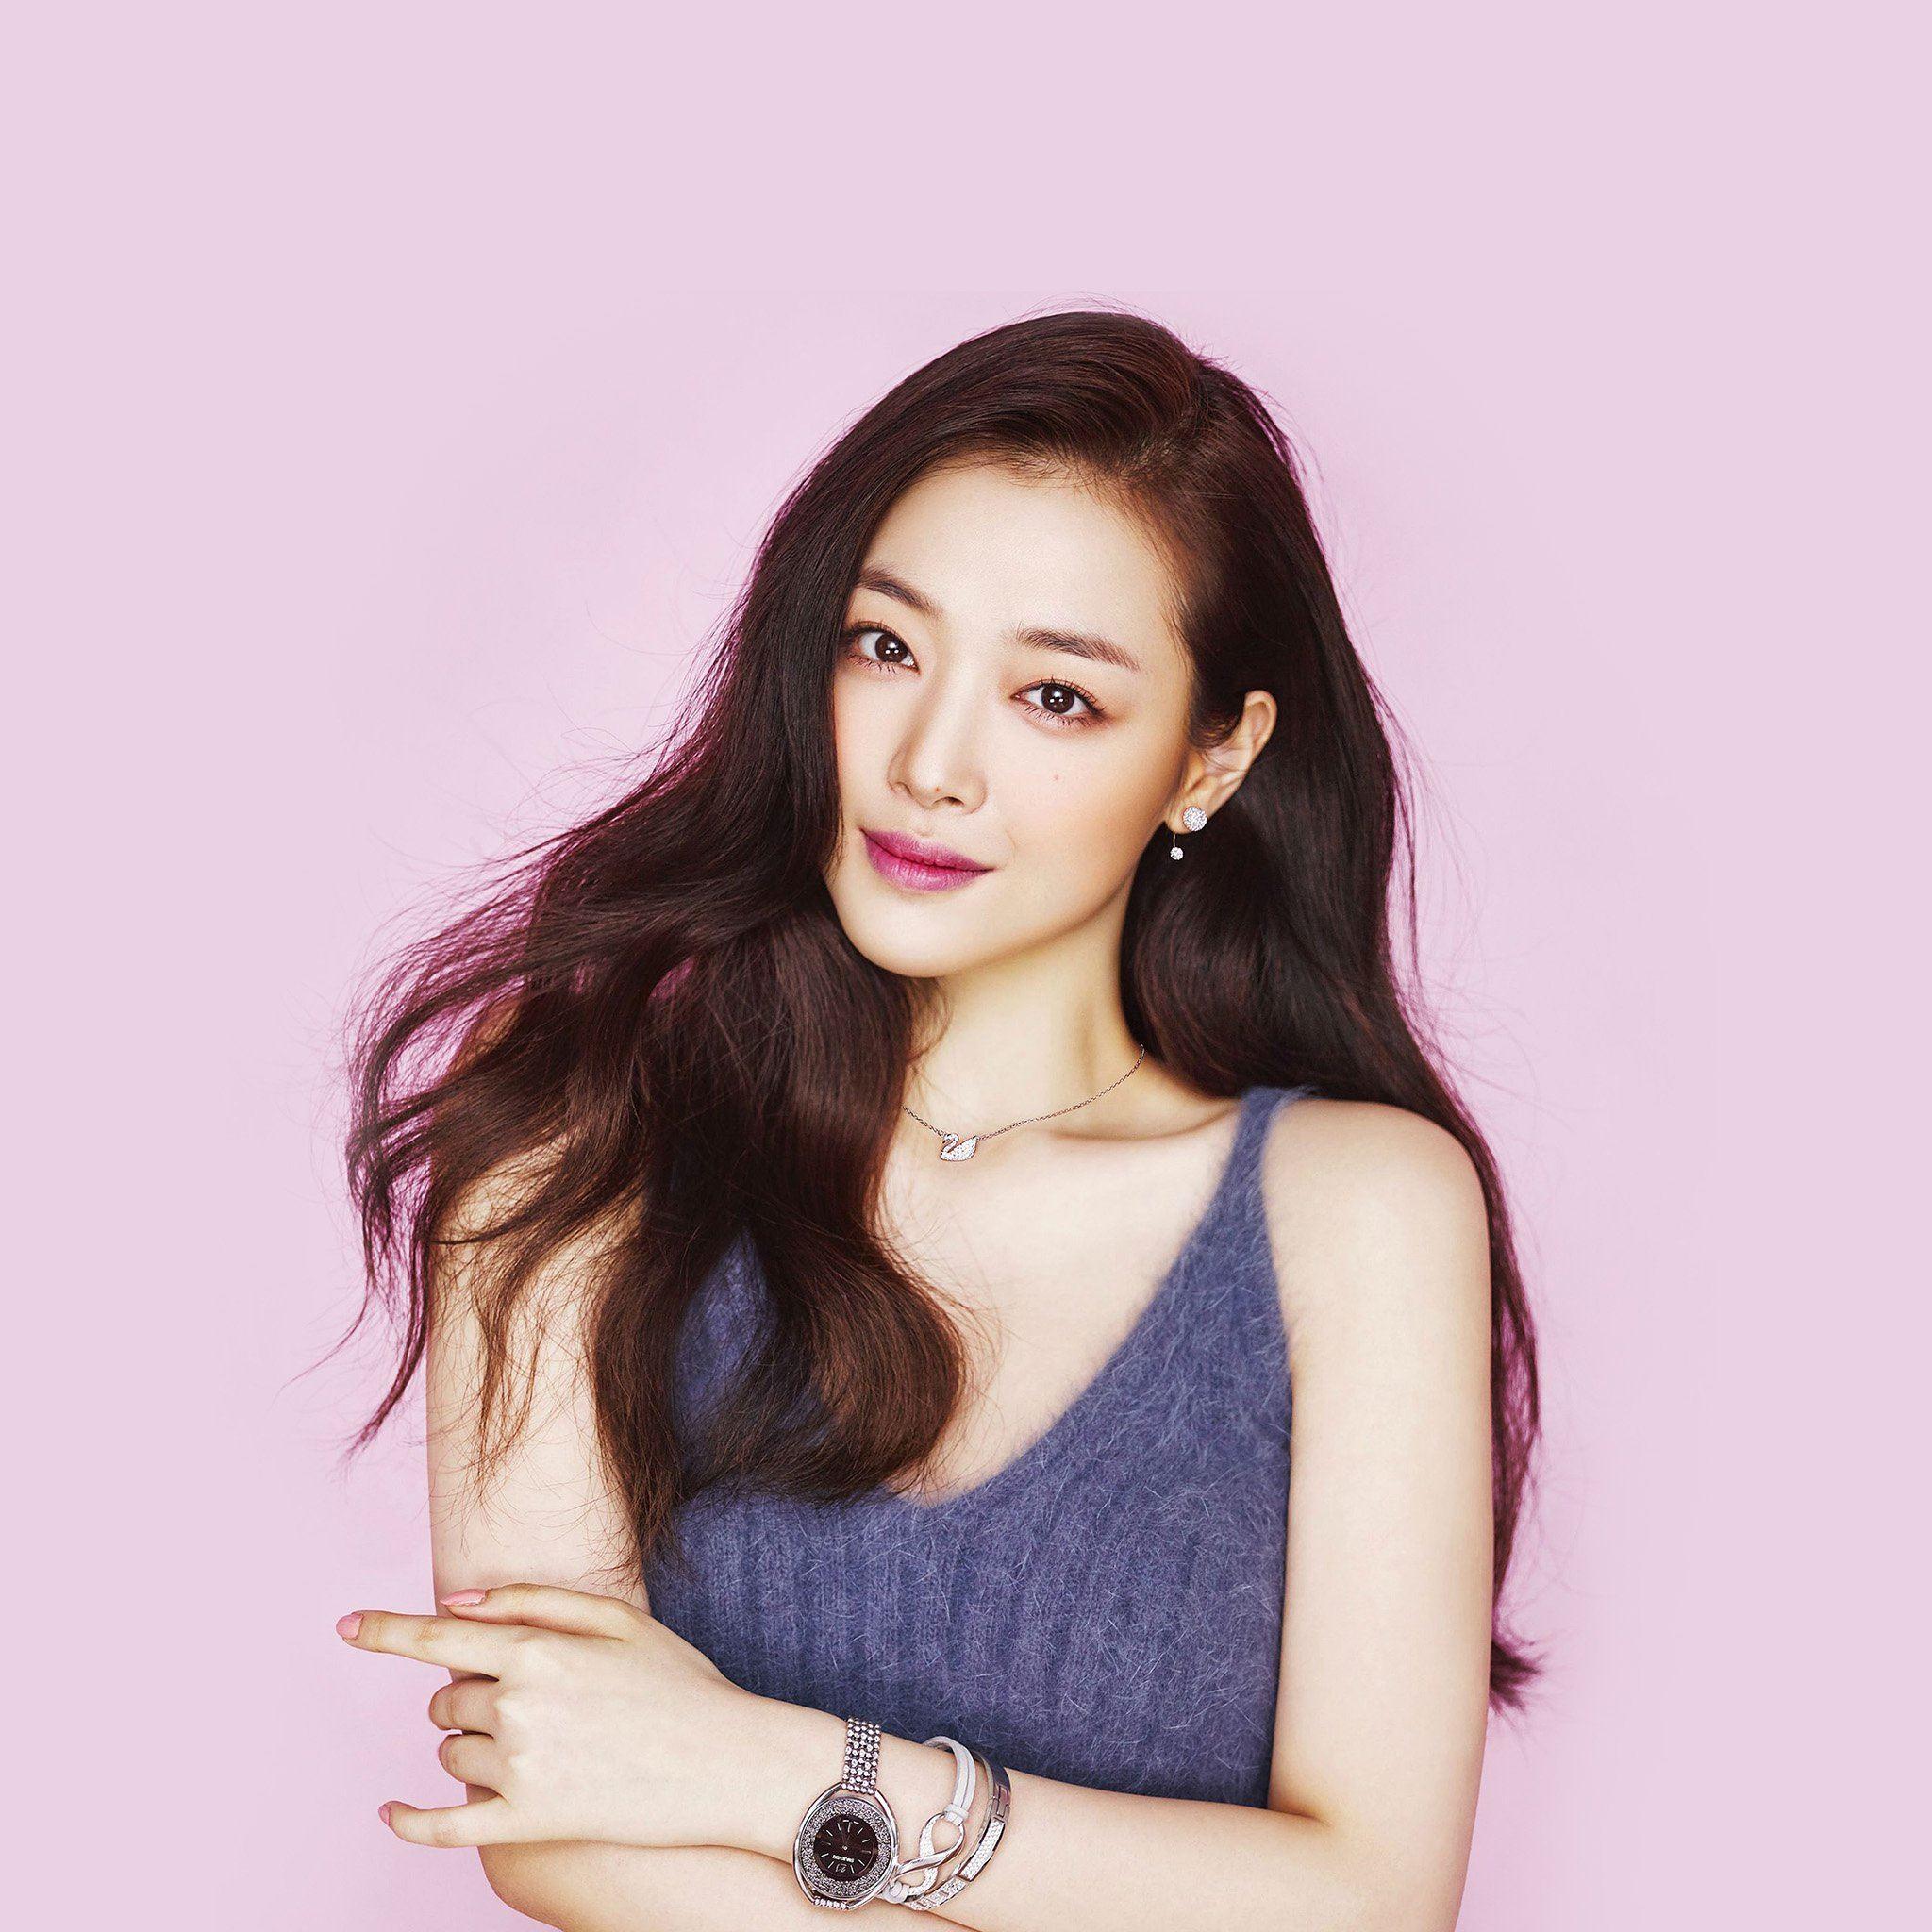 Sulli Kpop Pink Cute Girl Asian Ipad Air Wallpapers Free